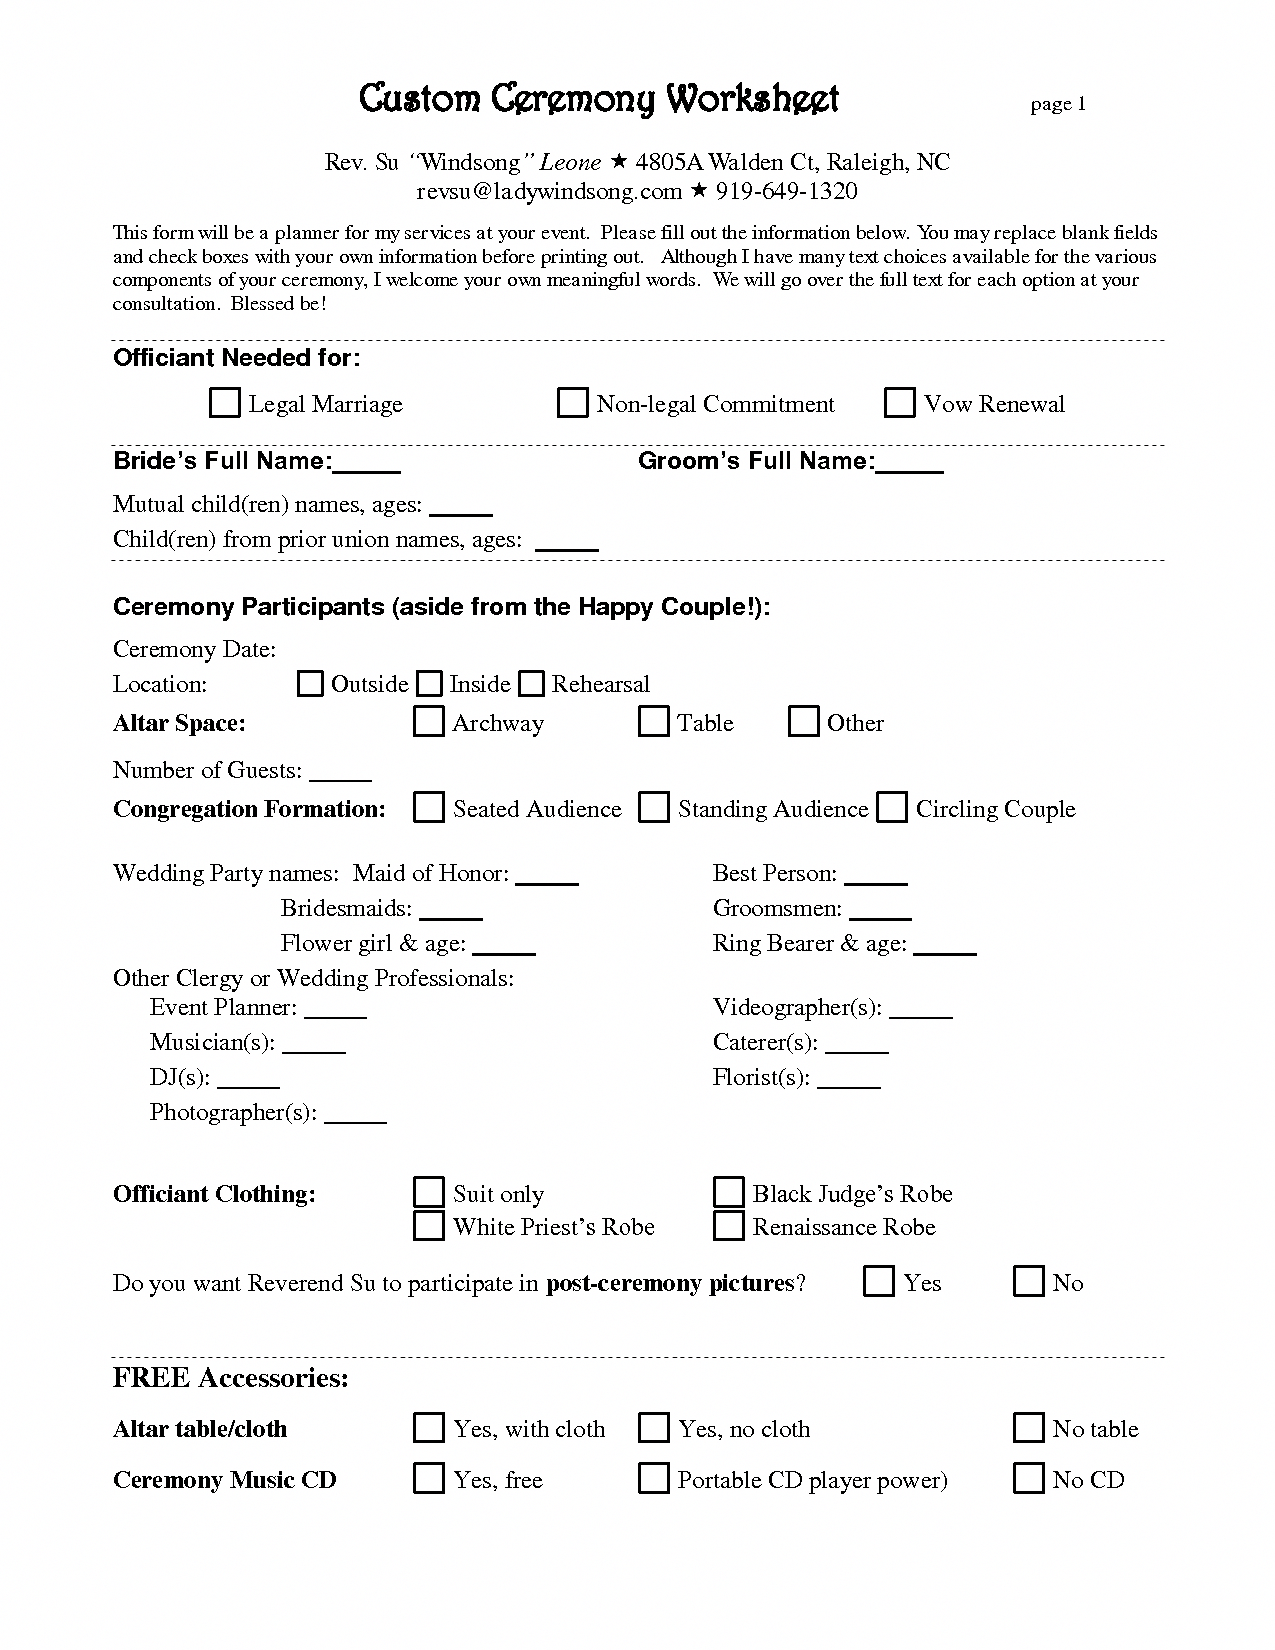 Free Wedding Planner Contract Template Weddingcoordinator Wedding